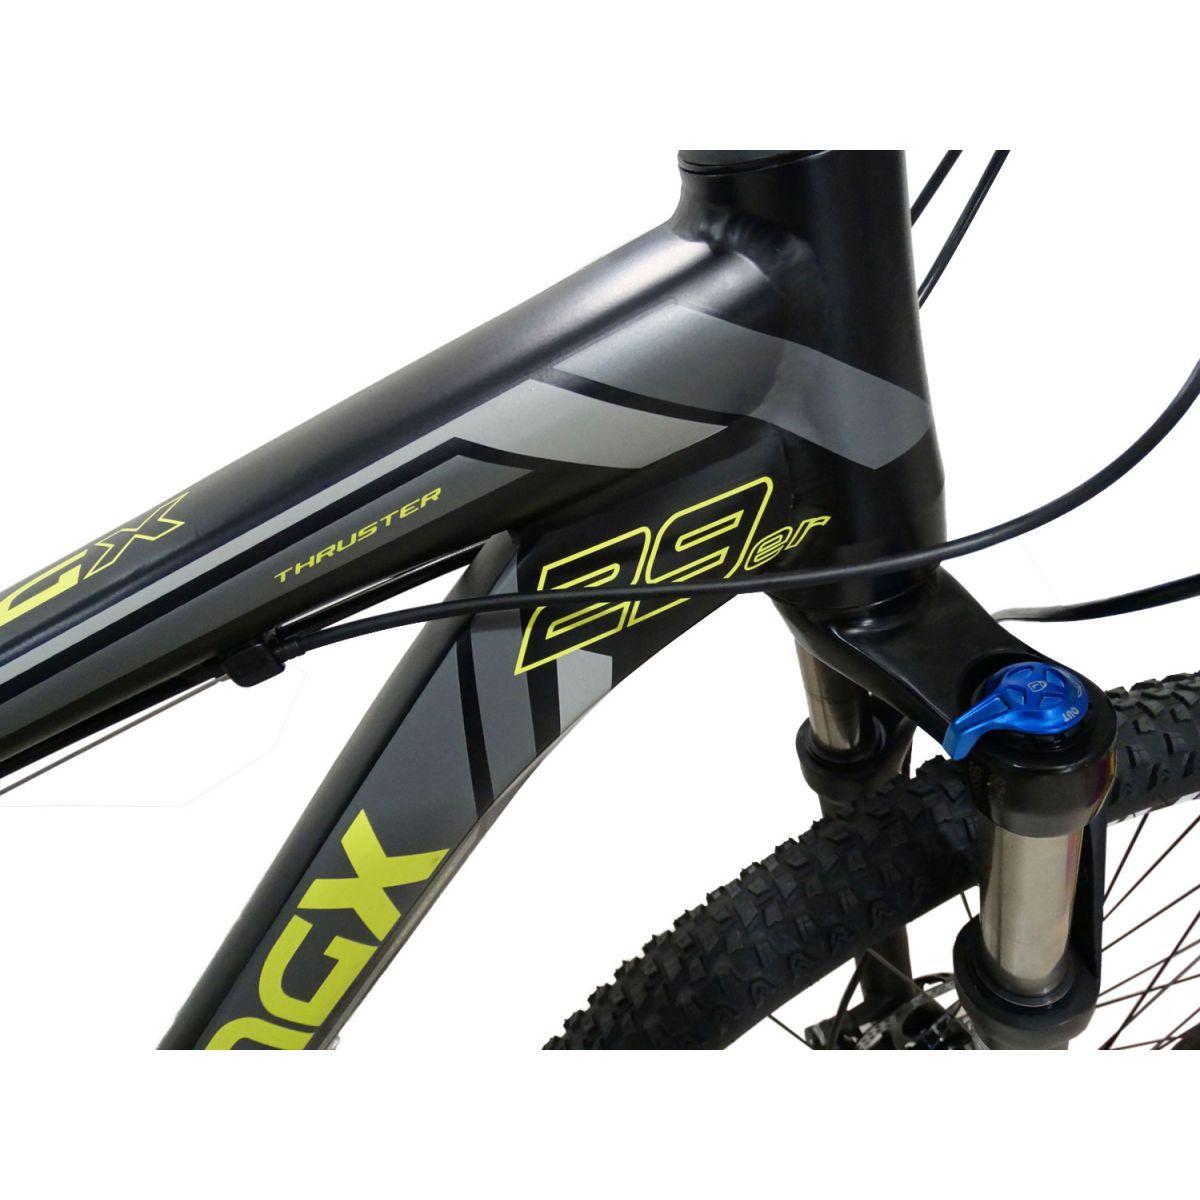 Bicicleta VIKINGX Thruster aro 29 - Ltwoo 20V - Freio Hidráulico